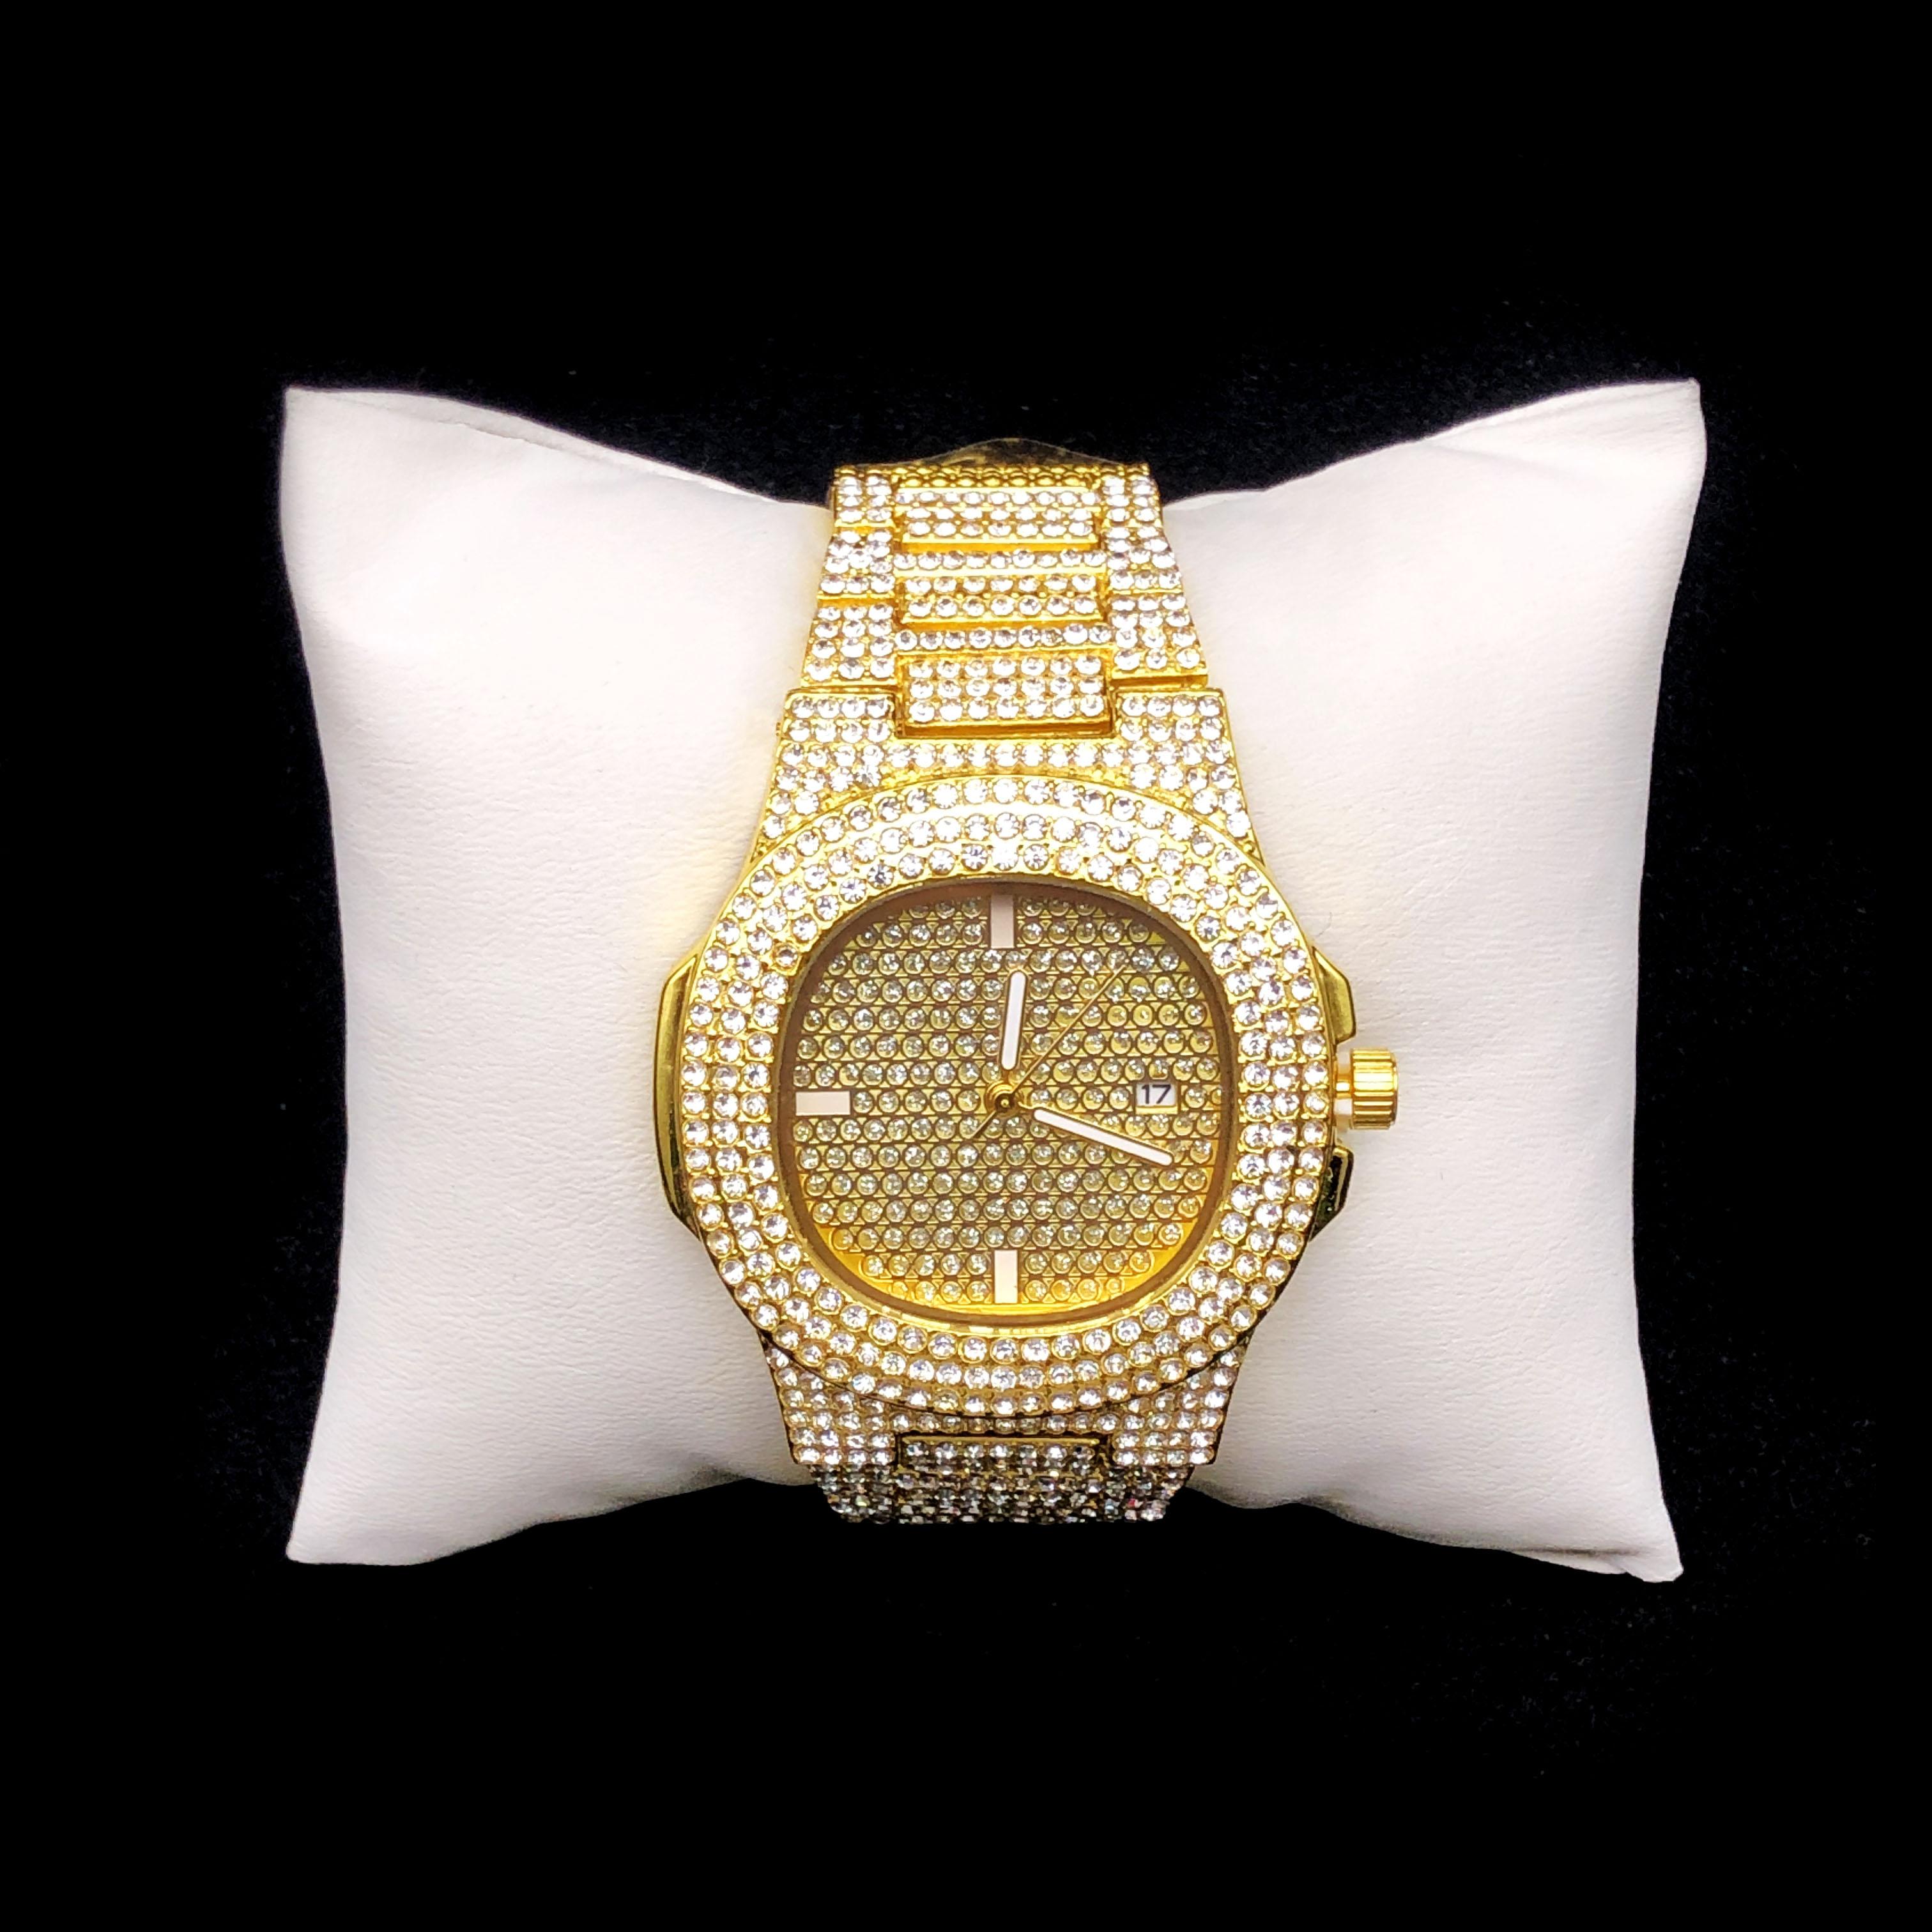 Luxury Men's Watches Hip-hop Alloy Ice Cuban Gold Geometric Watches Hip-hop Men's Fashion Jewelry